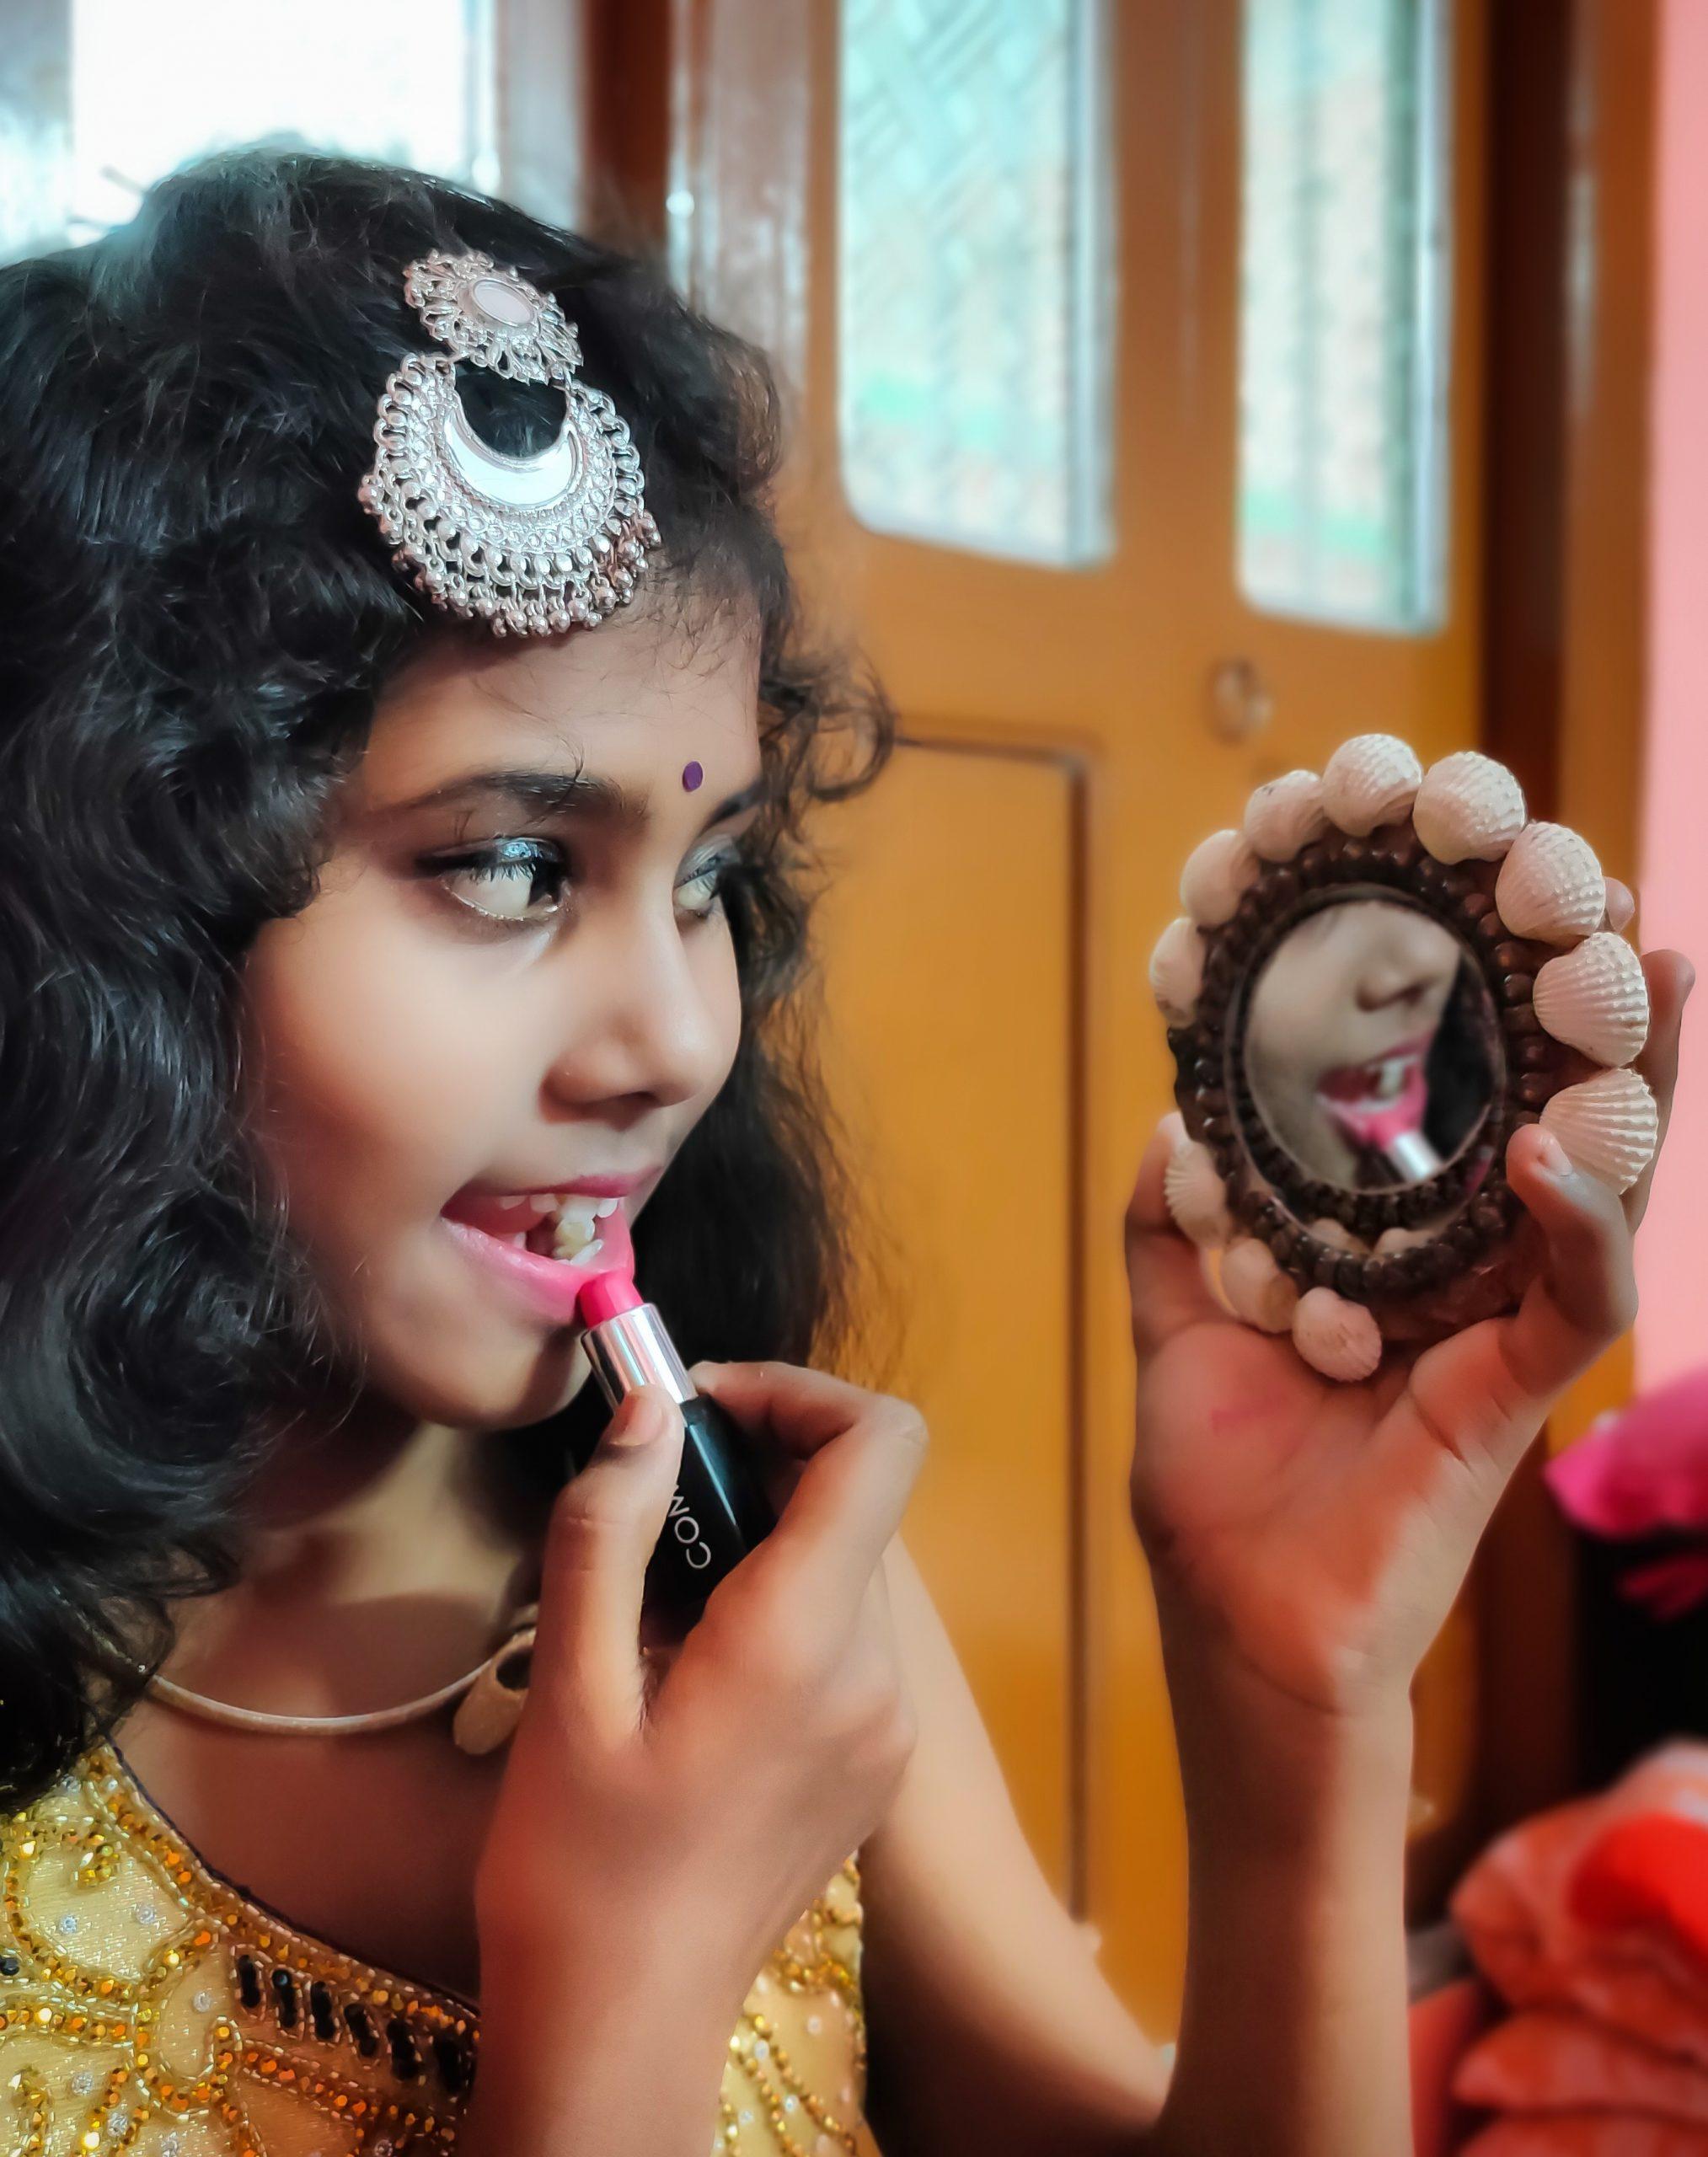 A girl using lipstick